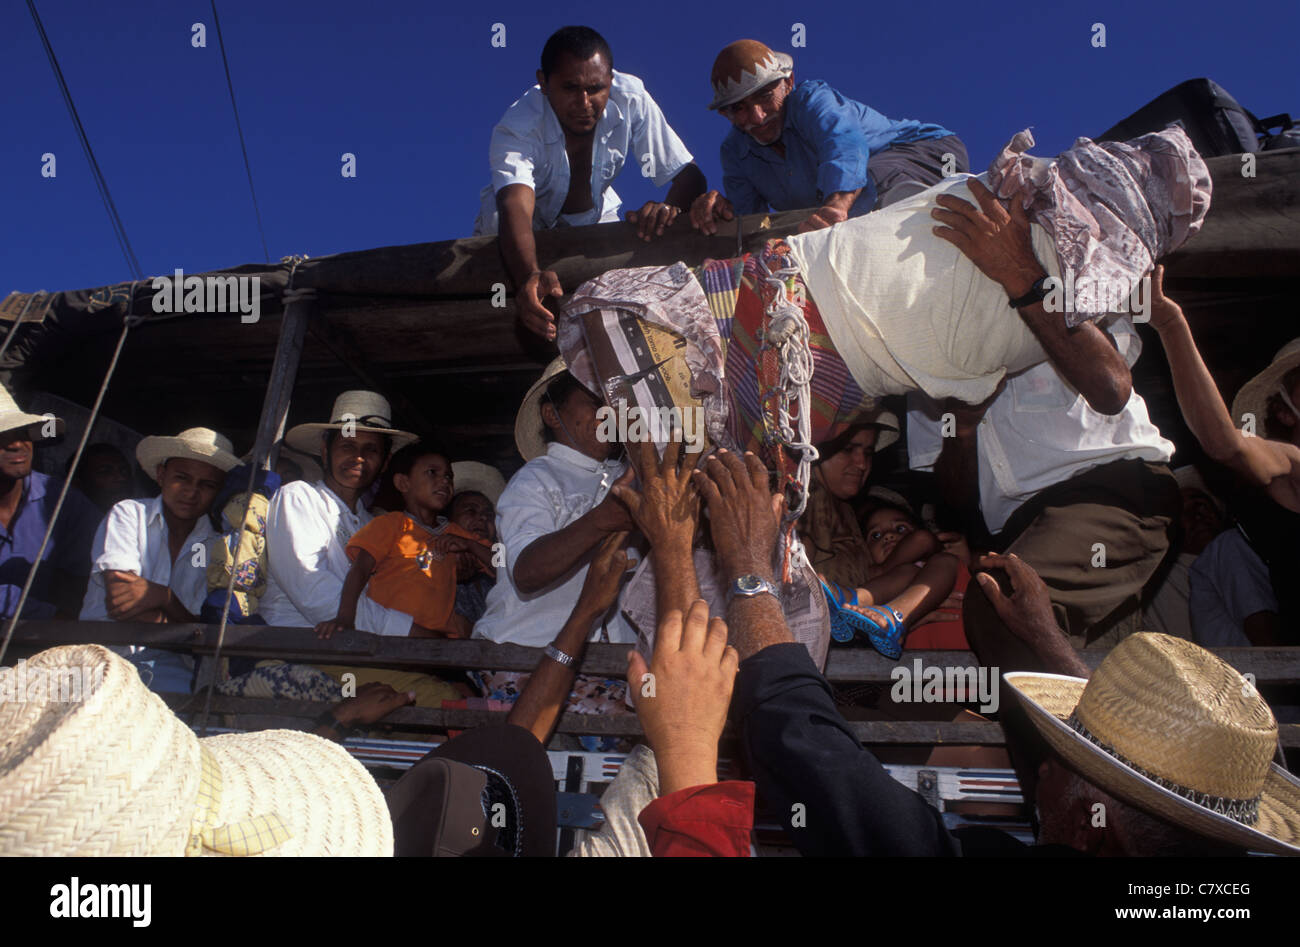 Catholicism, pilgrimage to Juazeiro do Norte city in Ceara State, Brazil. Pilgrims transport religious image Stock Photo